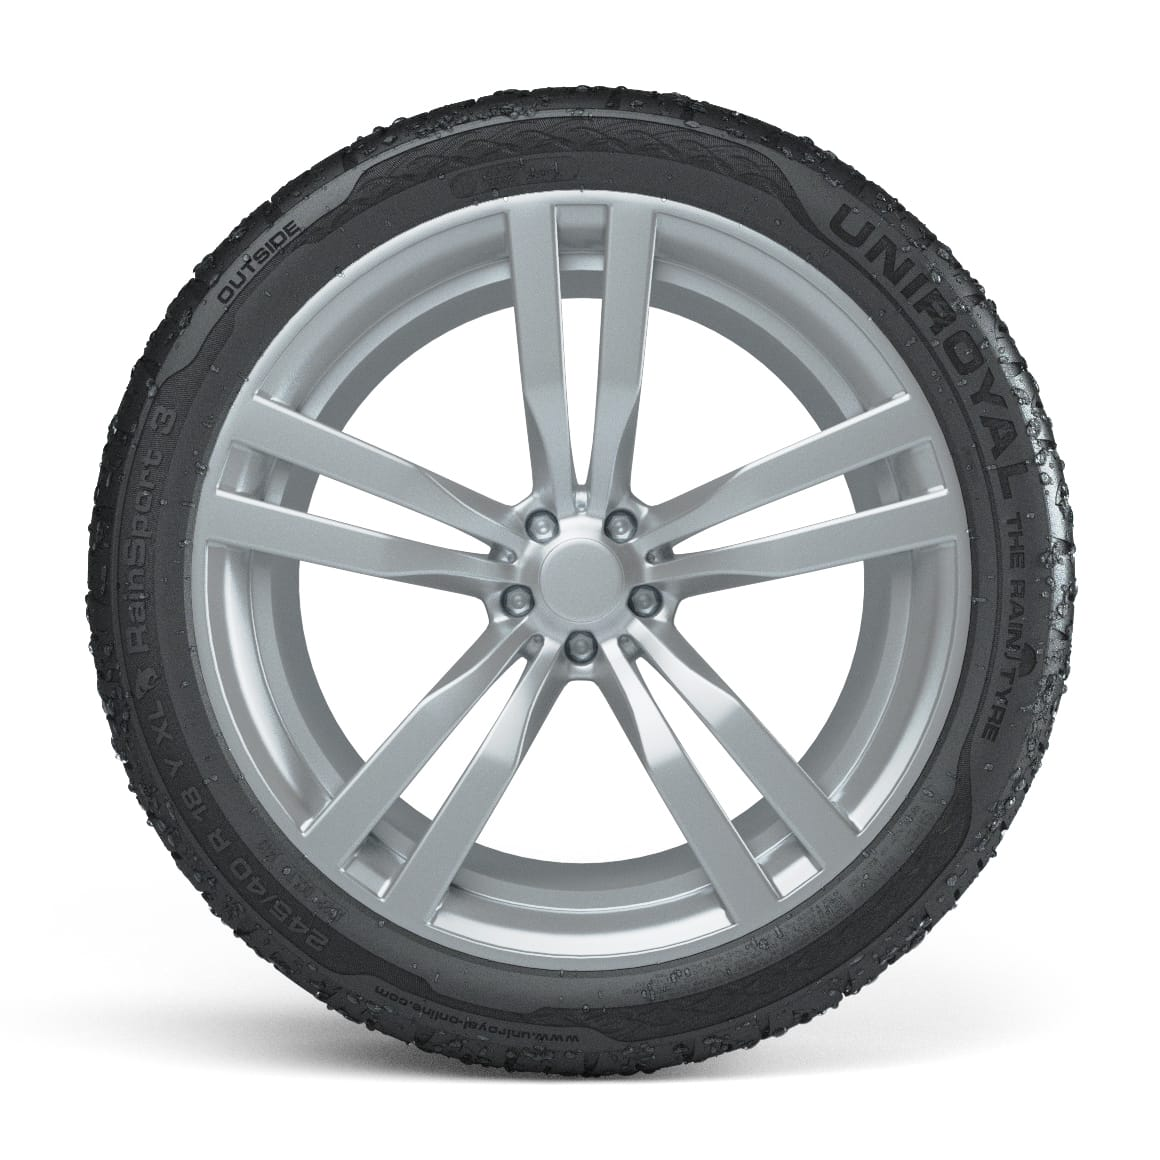 205 55 16 91V 2 x Uniroyal RainSport 3 Performance Road Car Tyres